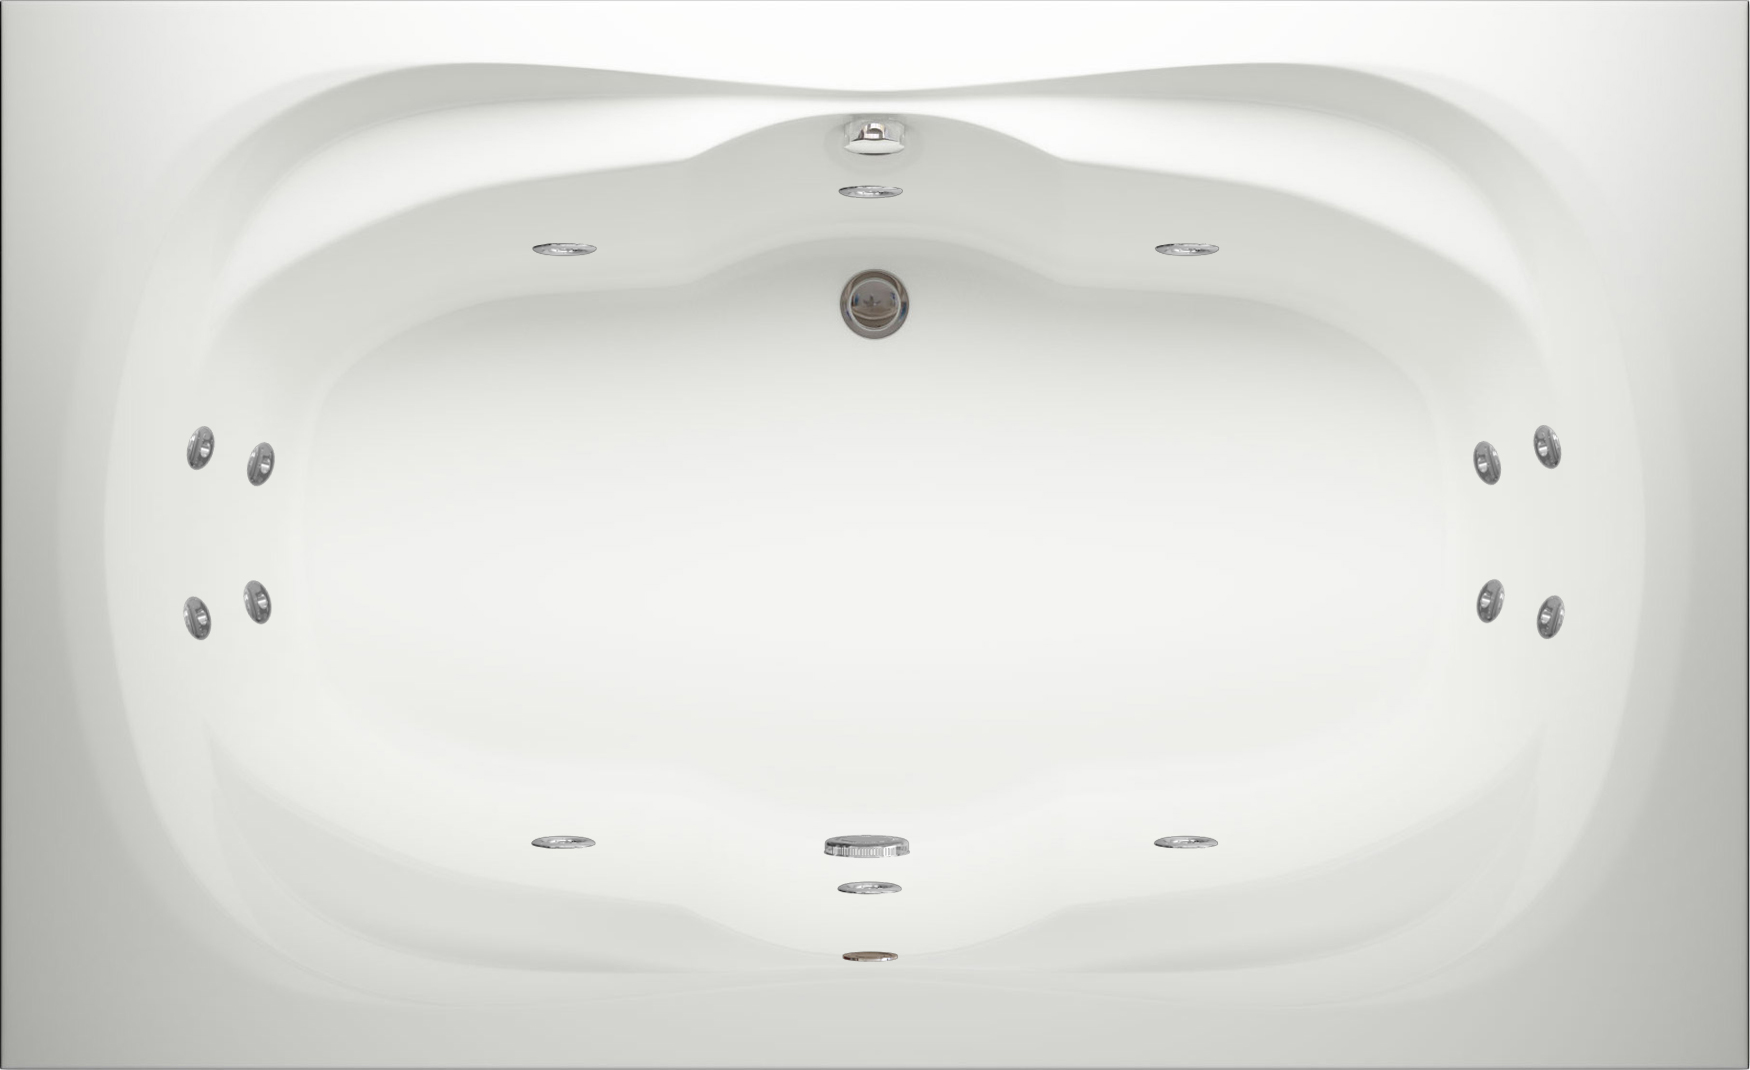 Ancona Quantum Double Ended Whirlpool Bath   Luna Spas